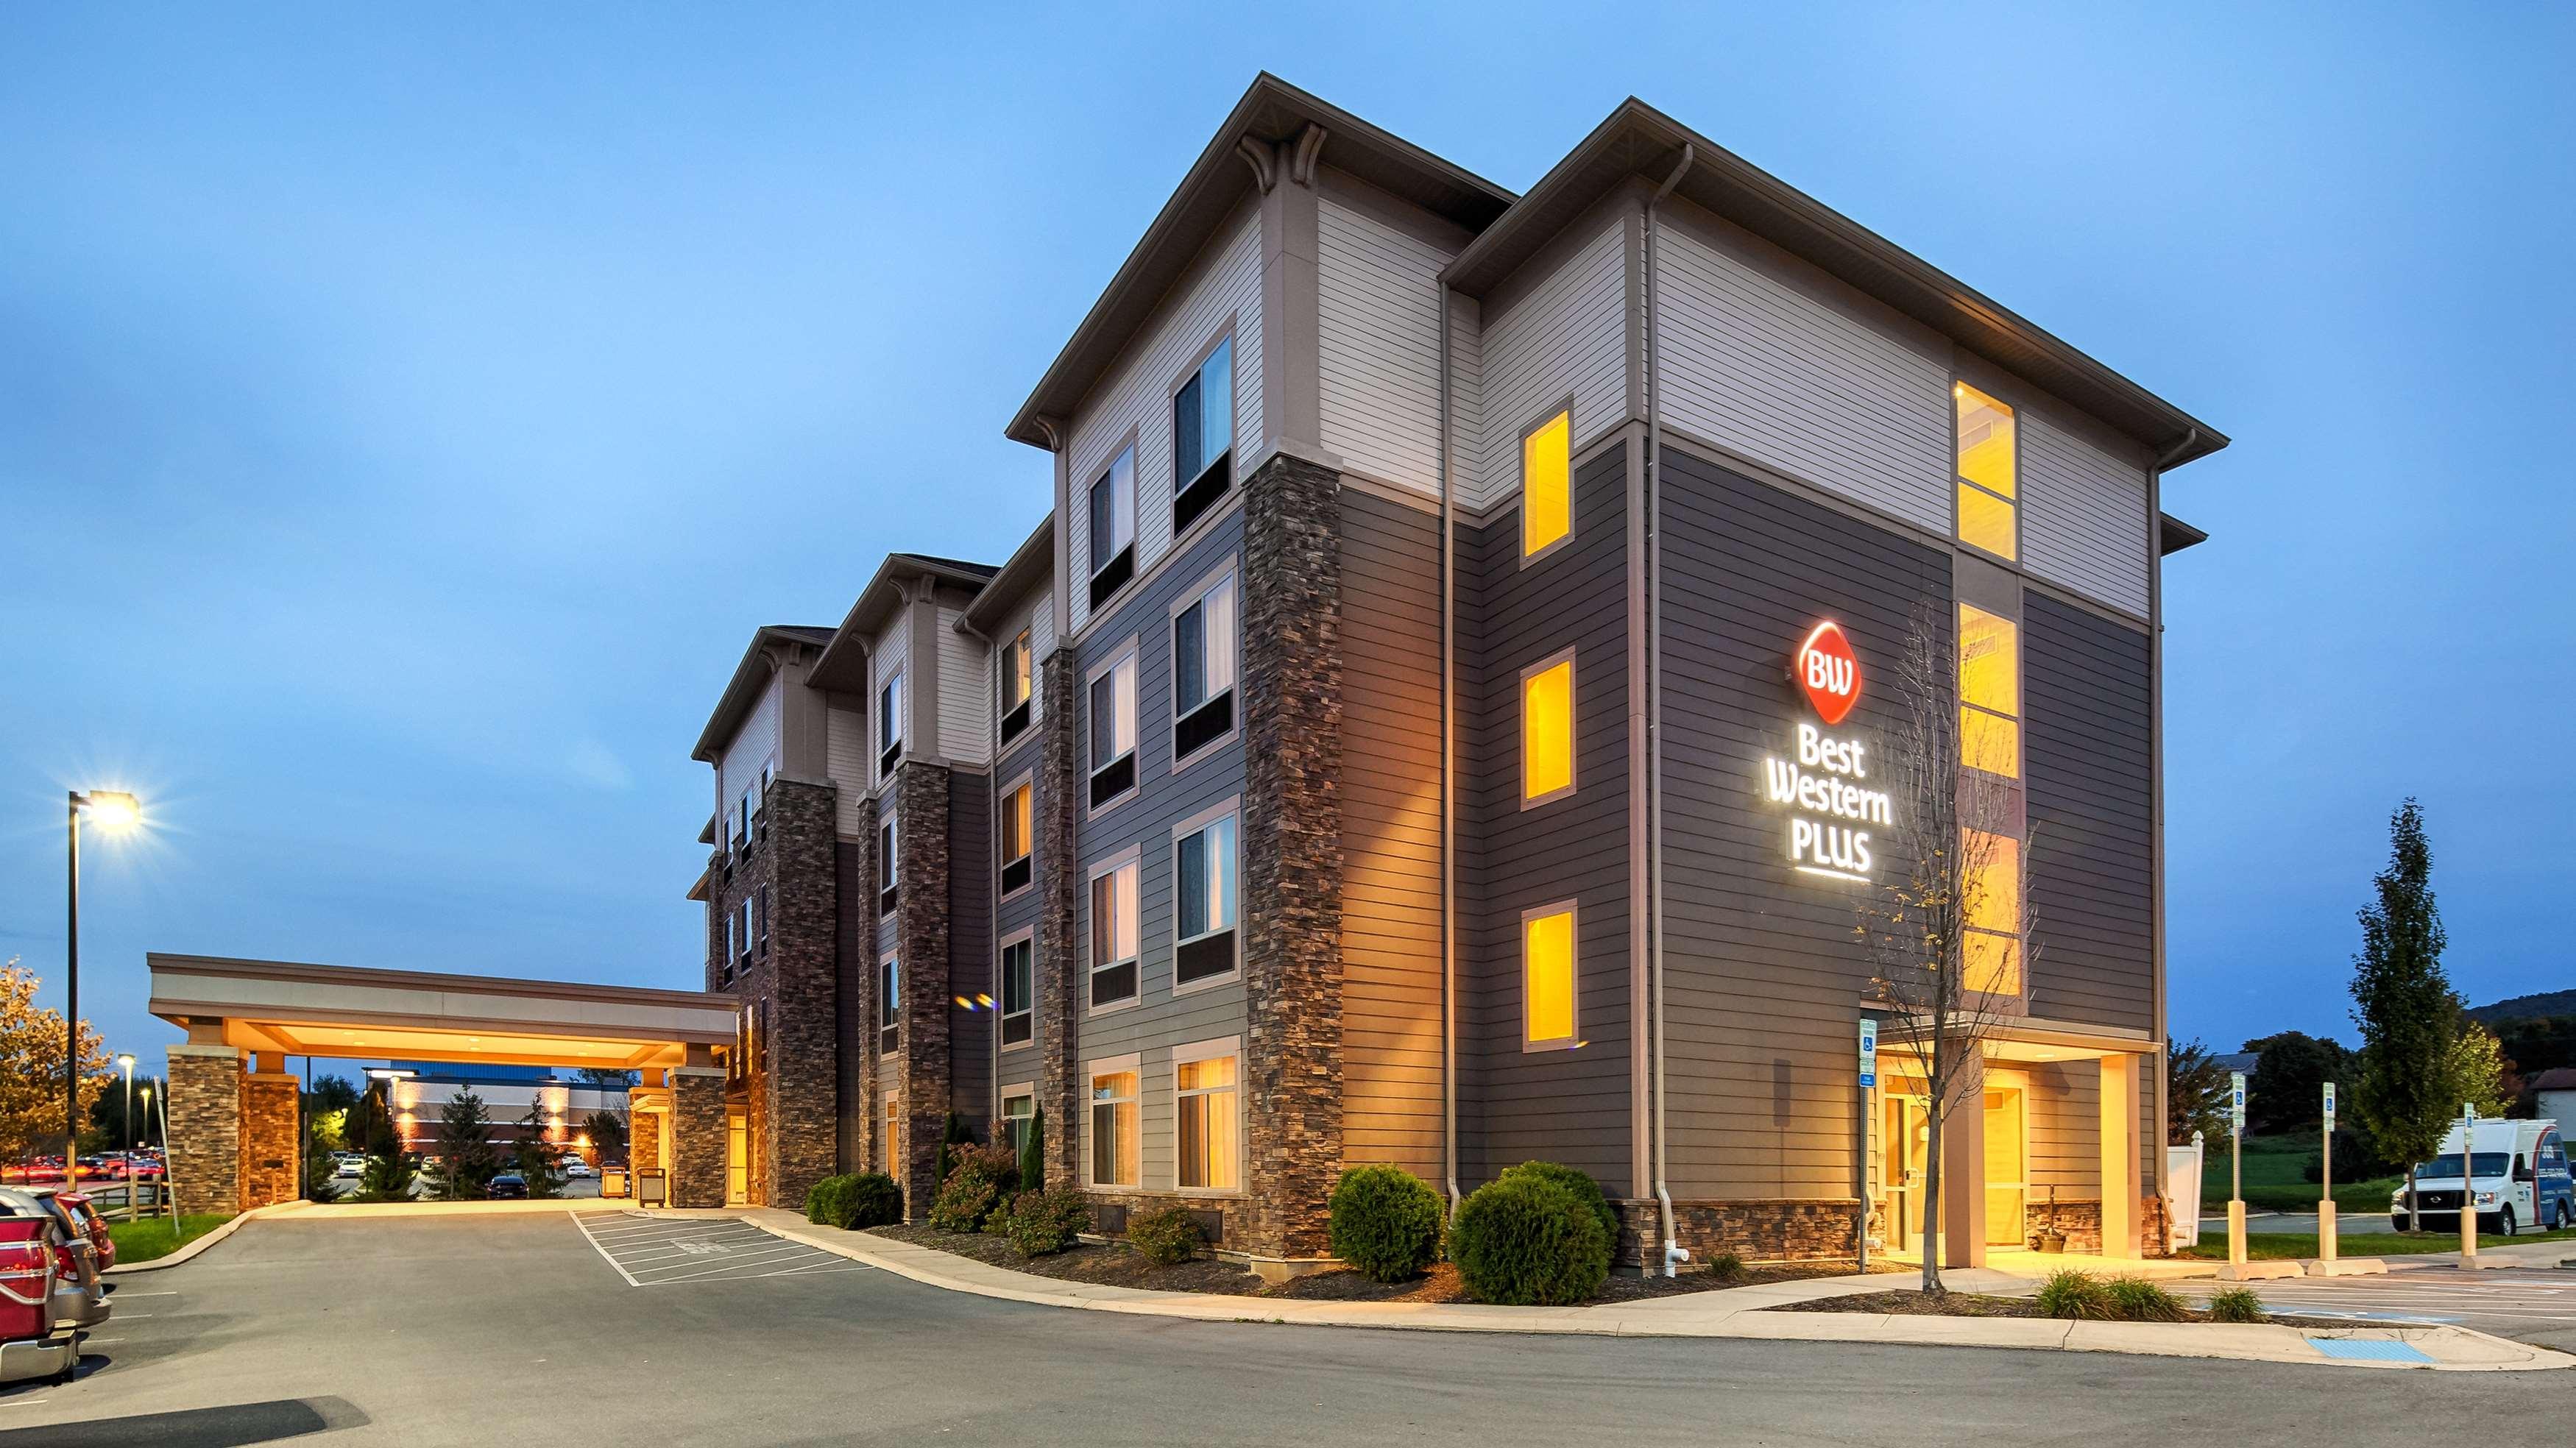 Best Western Plus University Park Inn & Suites image 0